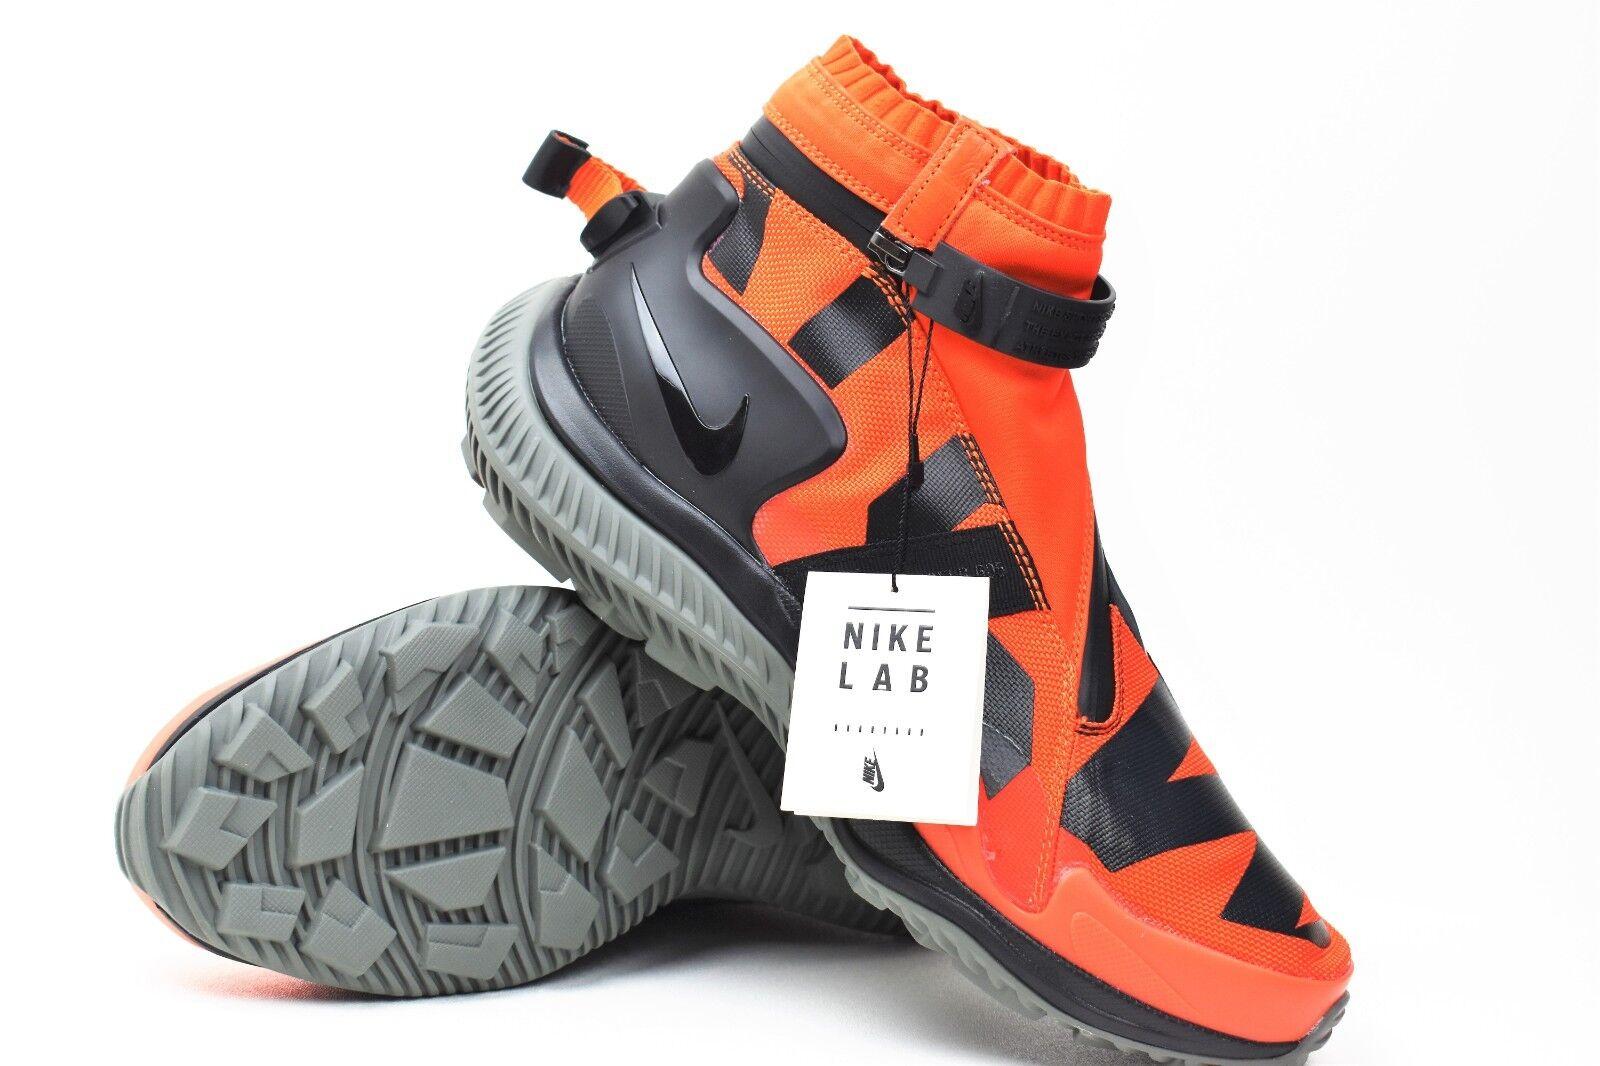 New Nike NIKELAB X NSW Gaiter Boot Size 9.5 orange Black Tum Grey AA0530-800